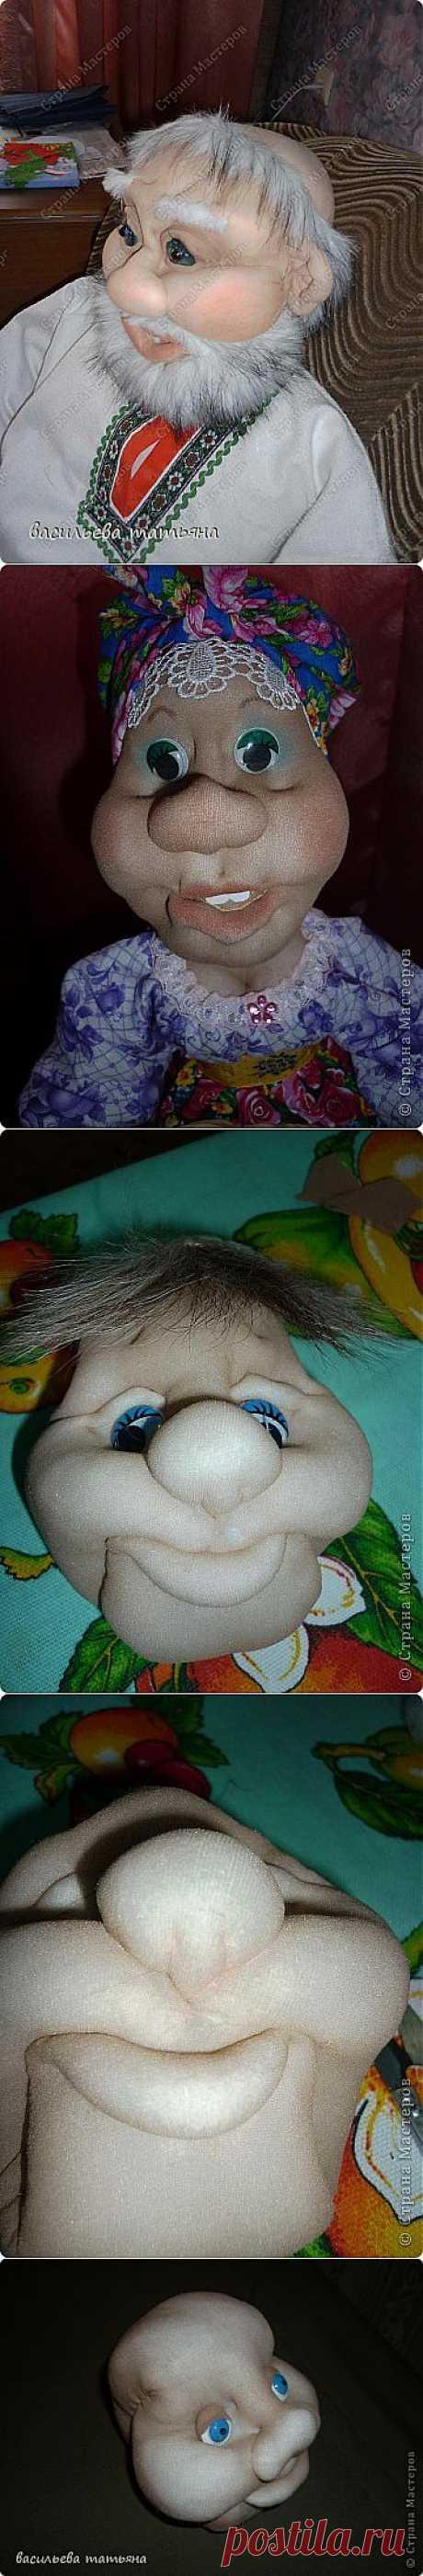 лицо колготочной куклы.